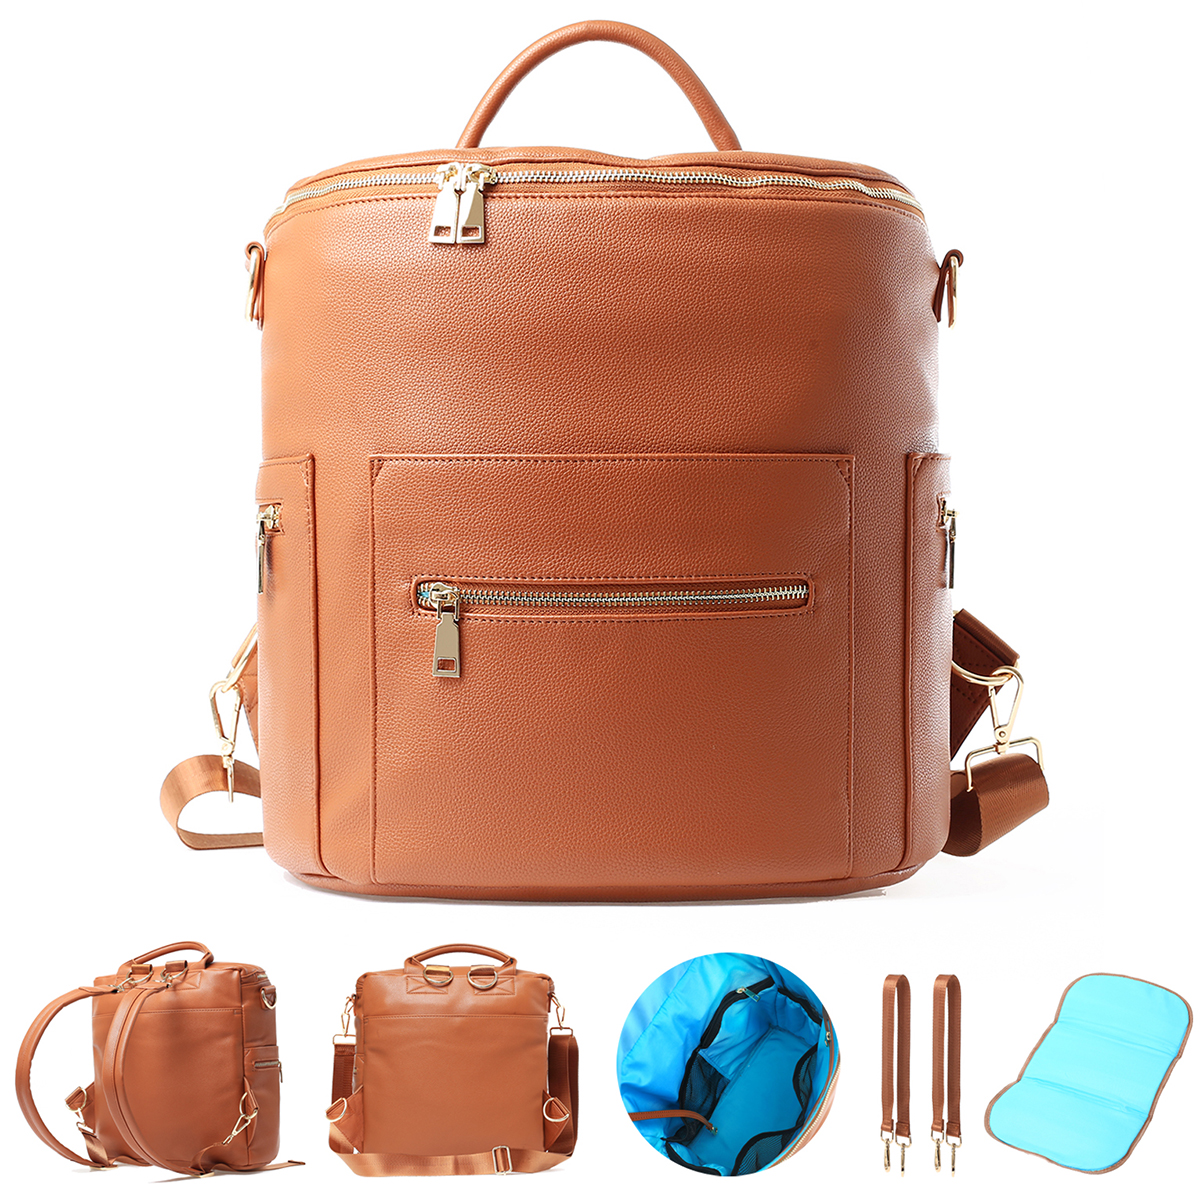 Laminated paper bag vegan leather Backpack